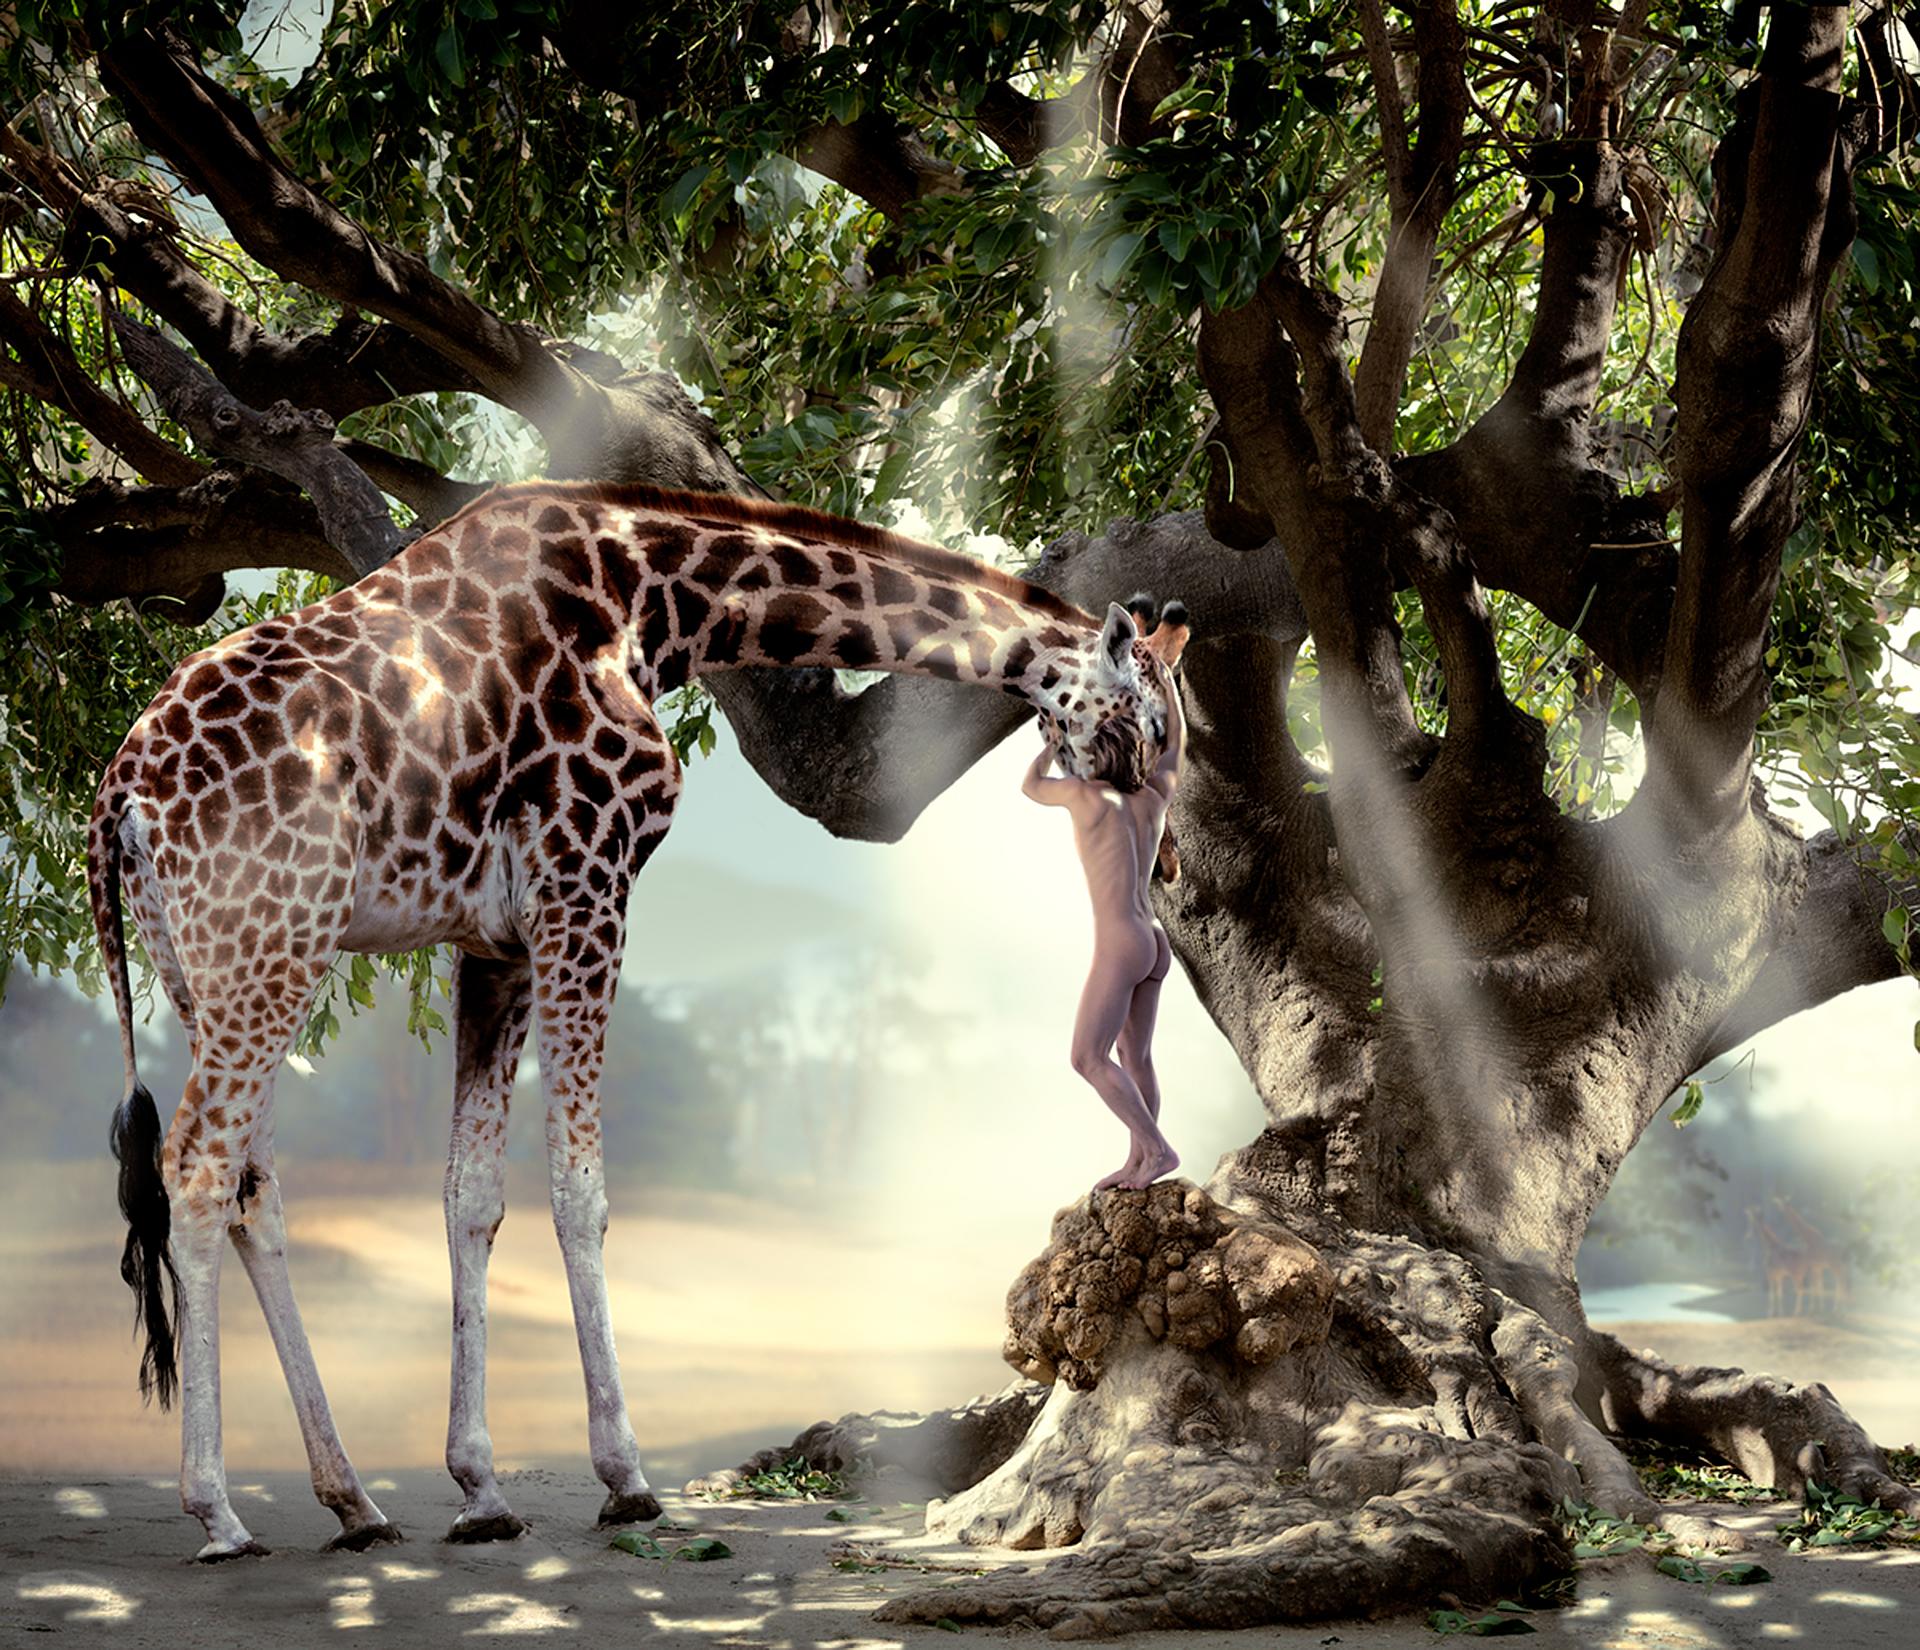 nude man hugging a giraffe, standing on an old tree